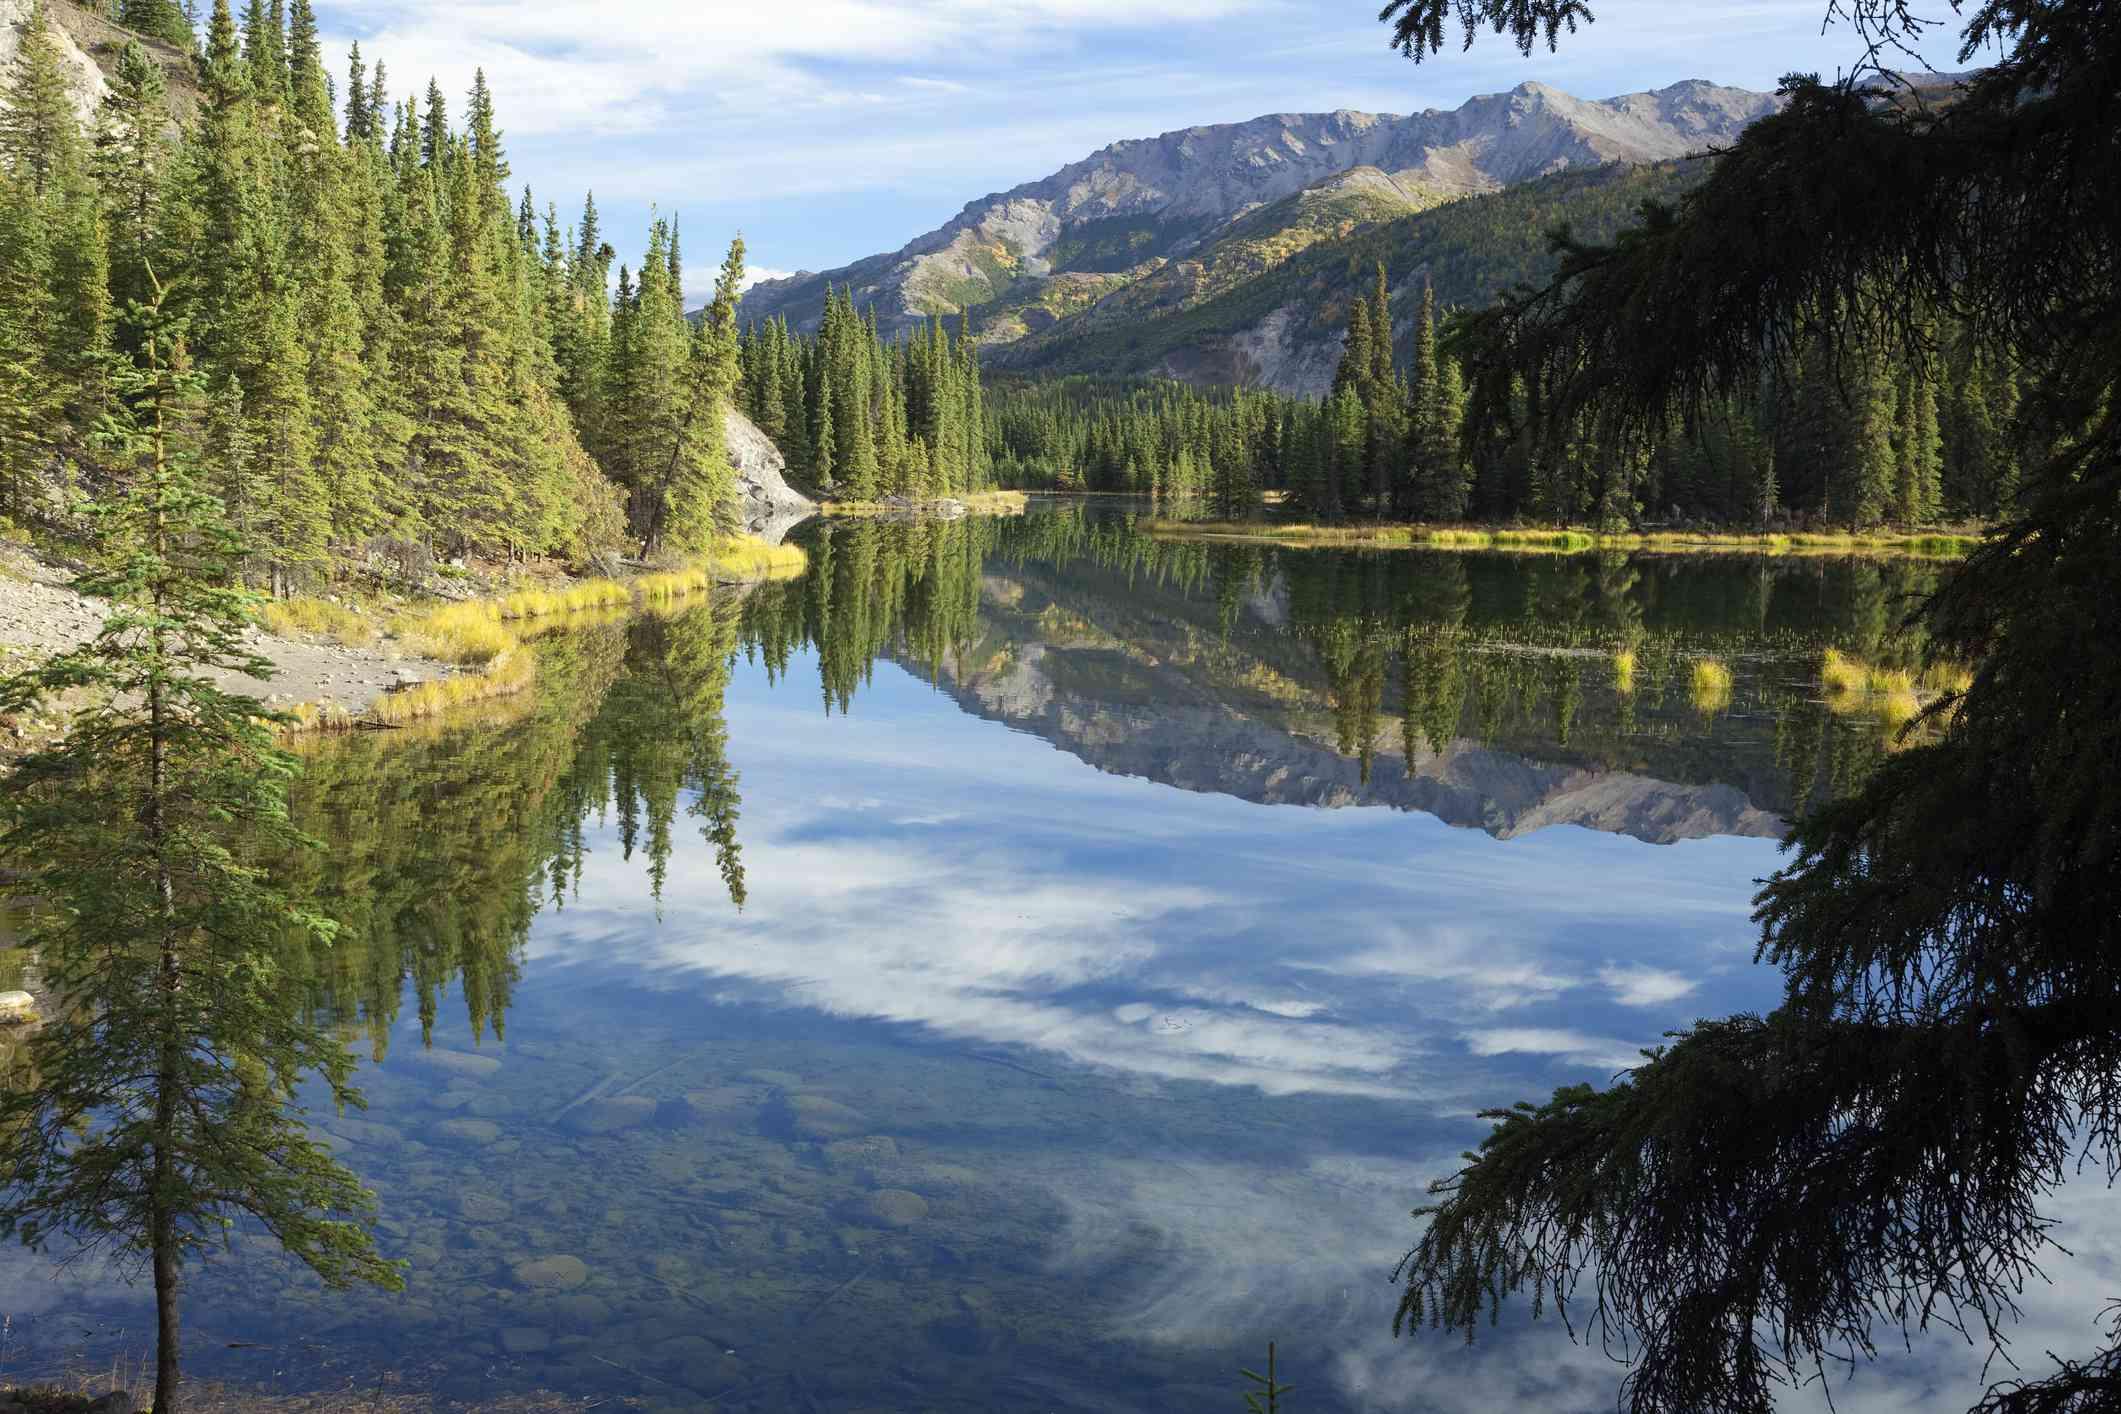 Cloud reflections in Horseshoe Lake in Alaska